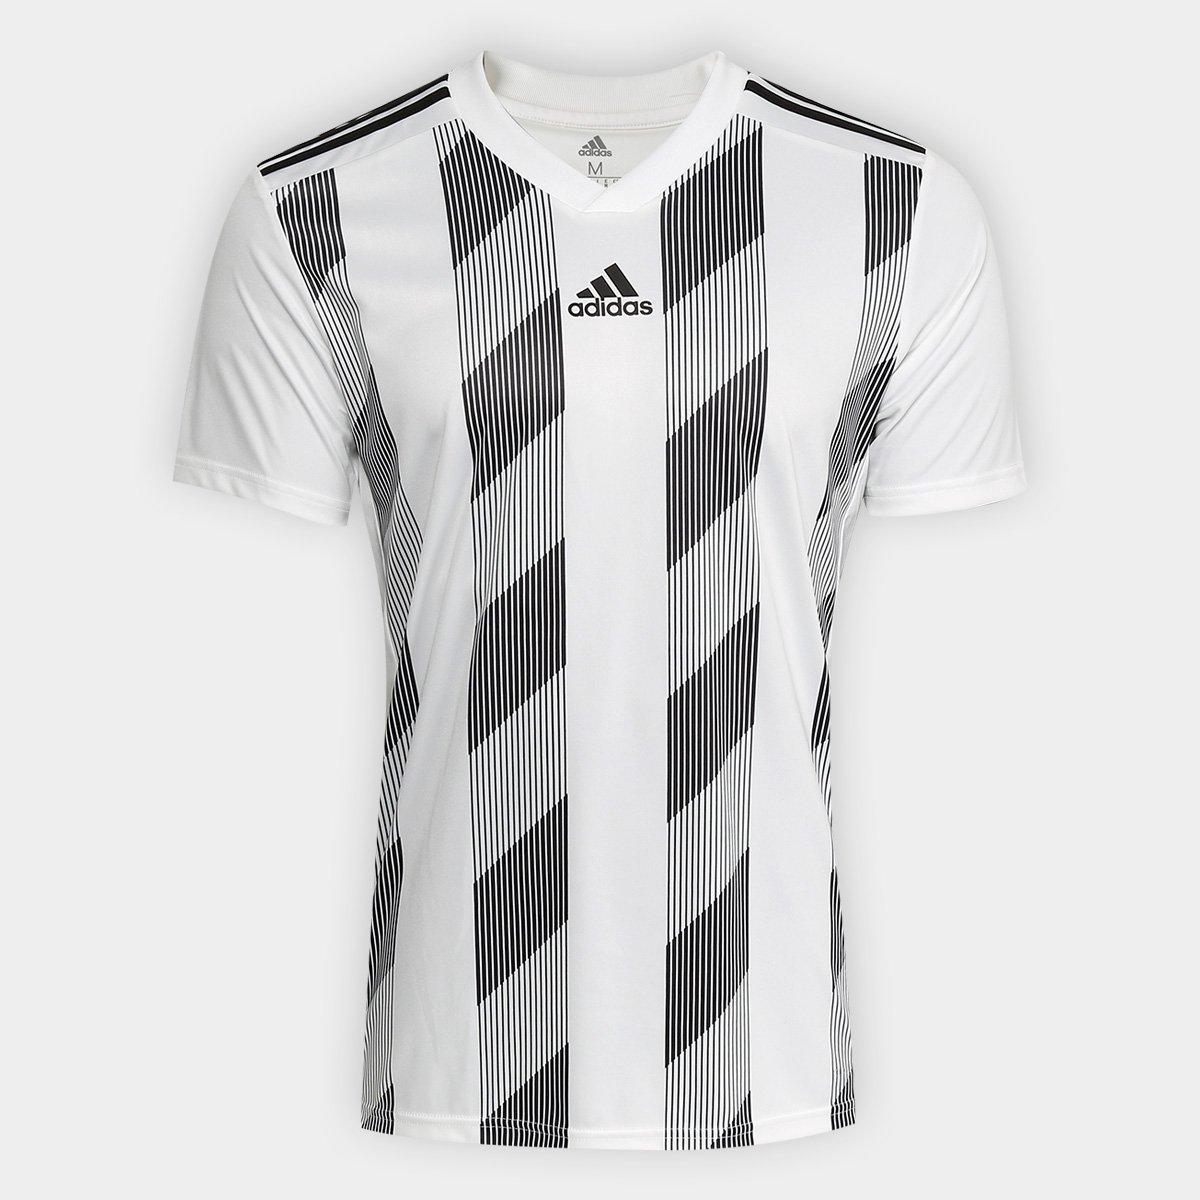 3d0db5261e2f8 Camisa Adidas Striped 19 Masculina - Branco e Preto - Compre Agora ...